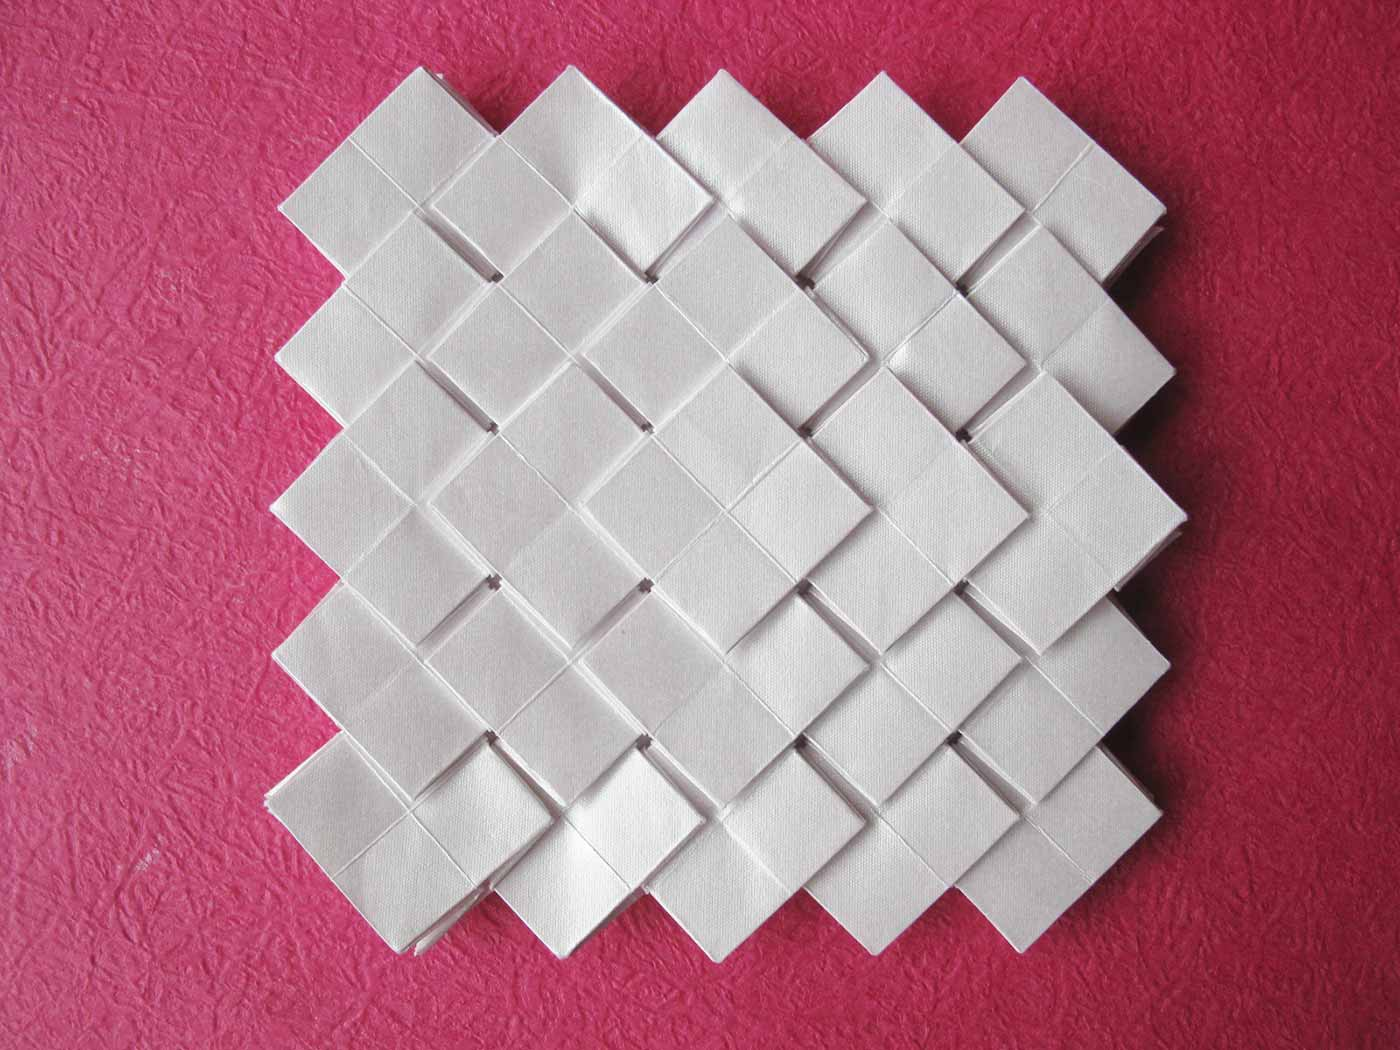 Shuzo Fujimoto's Clover Tessellation